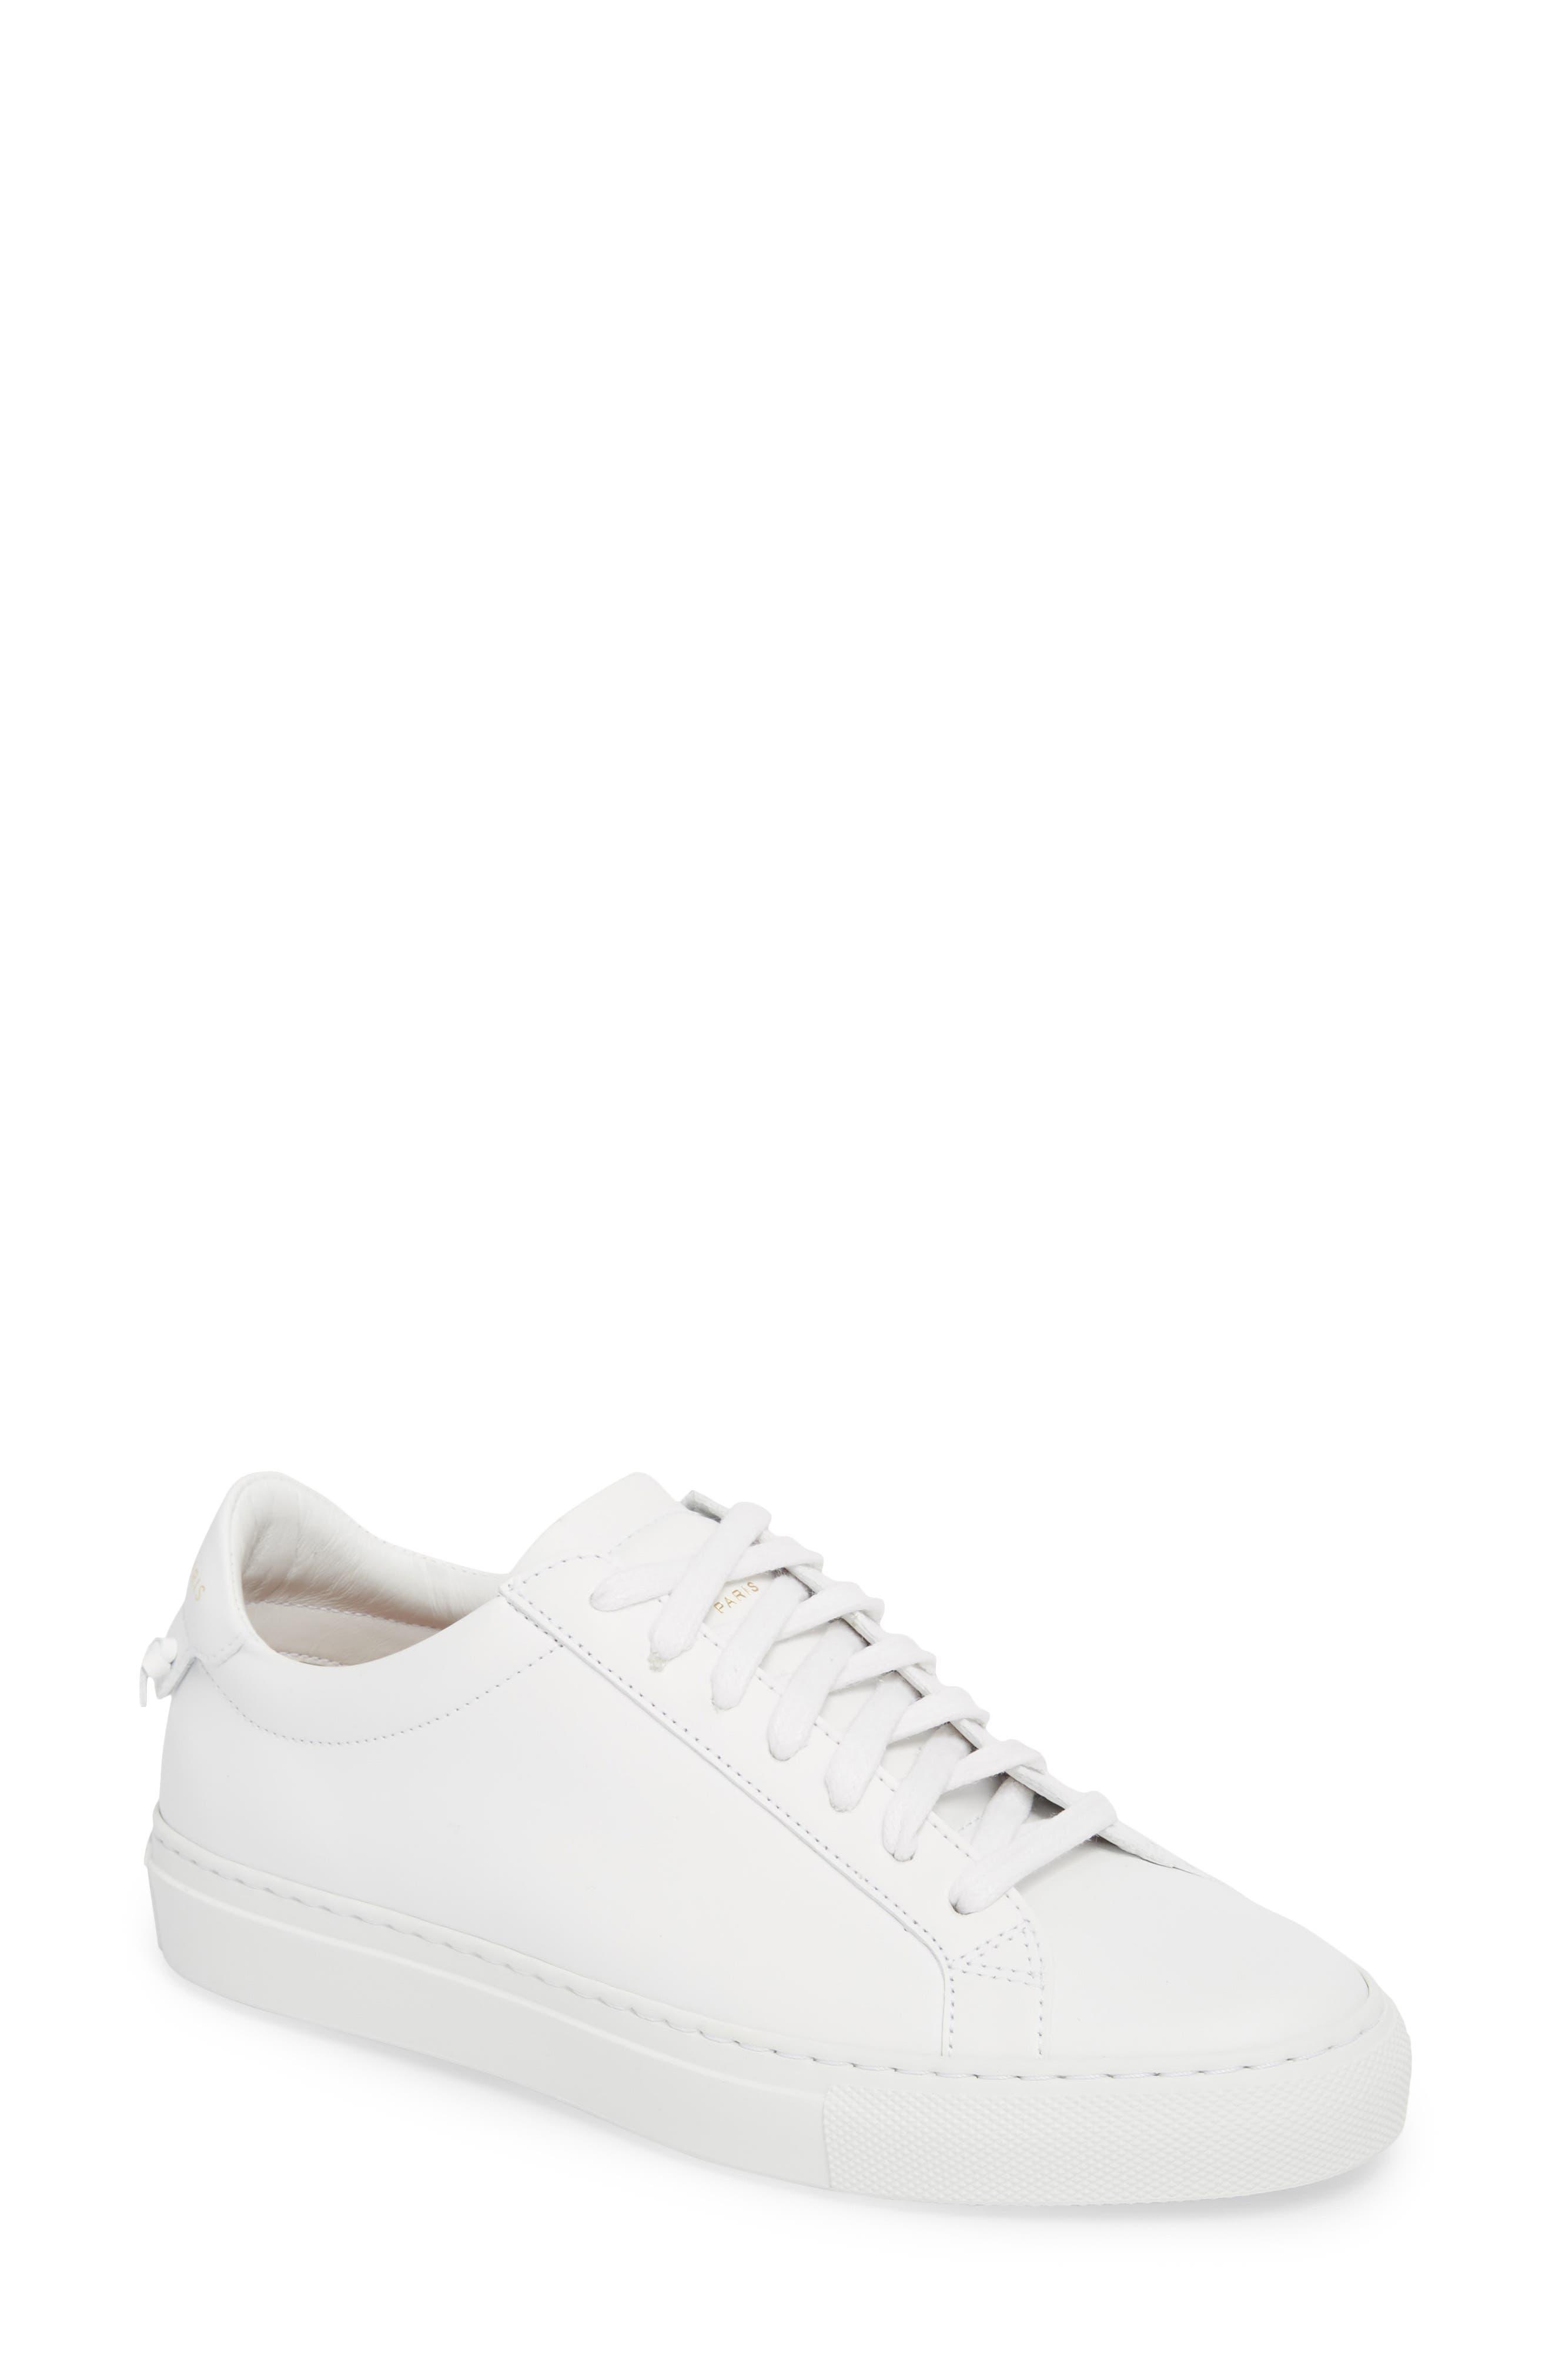 Low Top Sneaker,                         Main,                         color, OPTIC WHITE